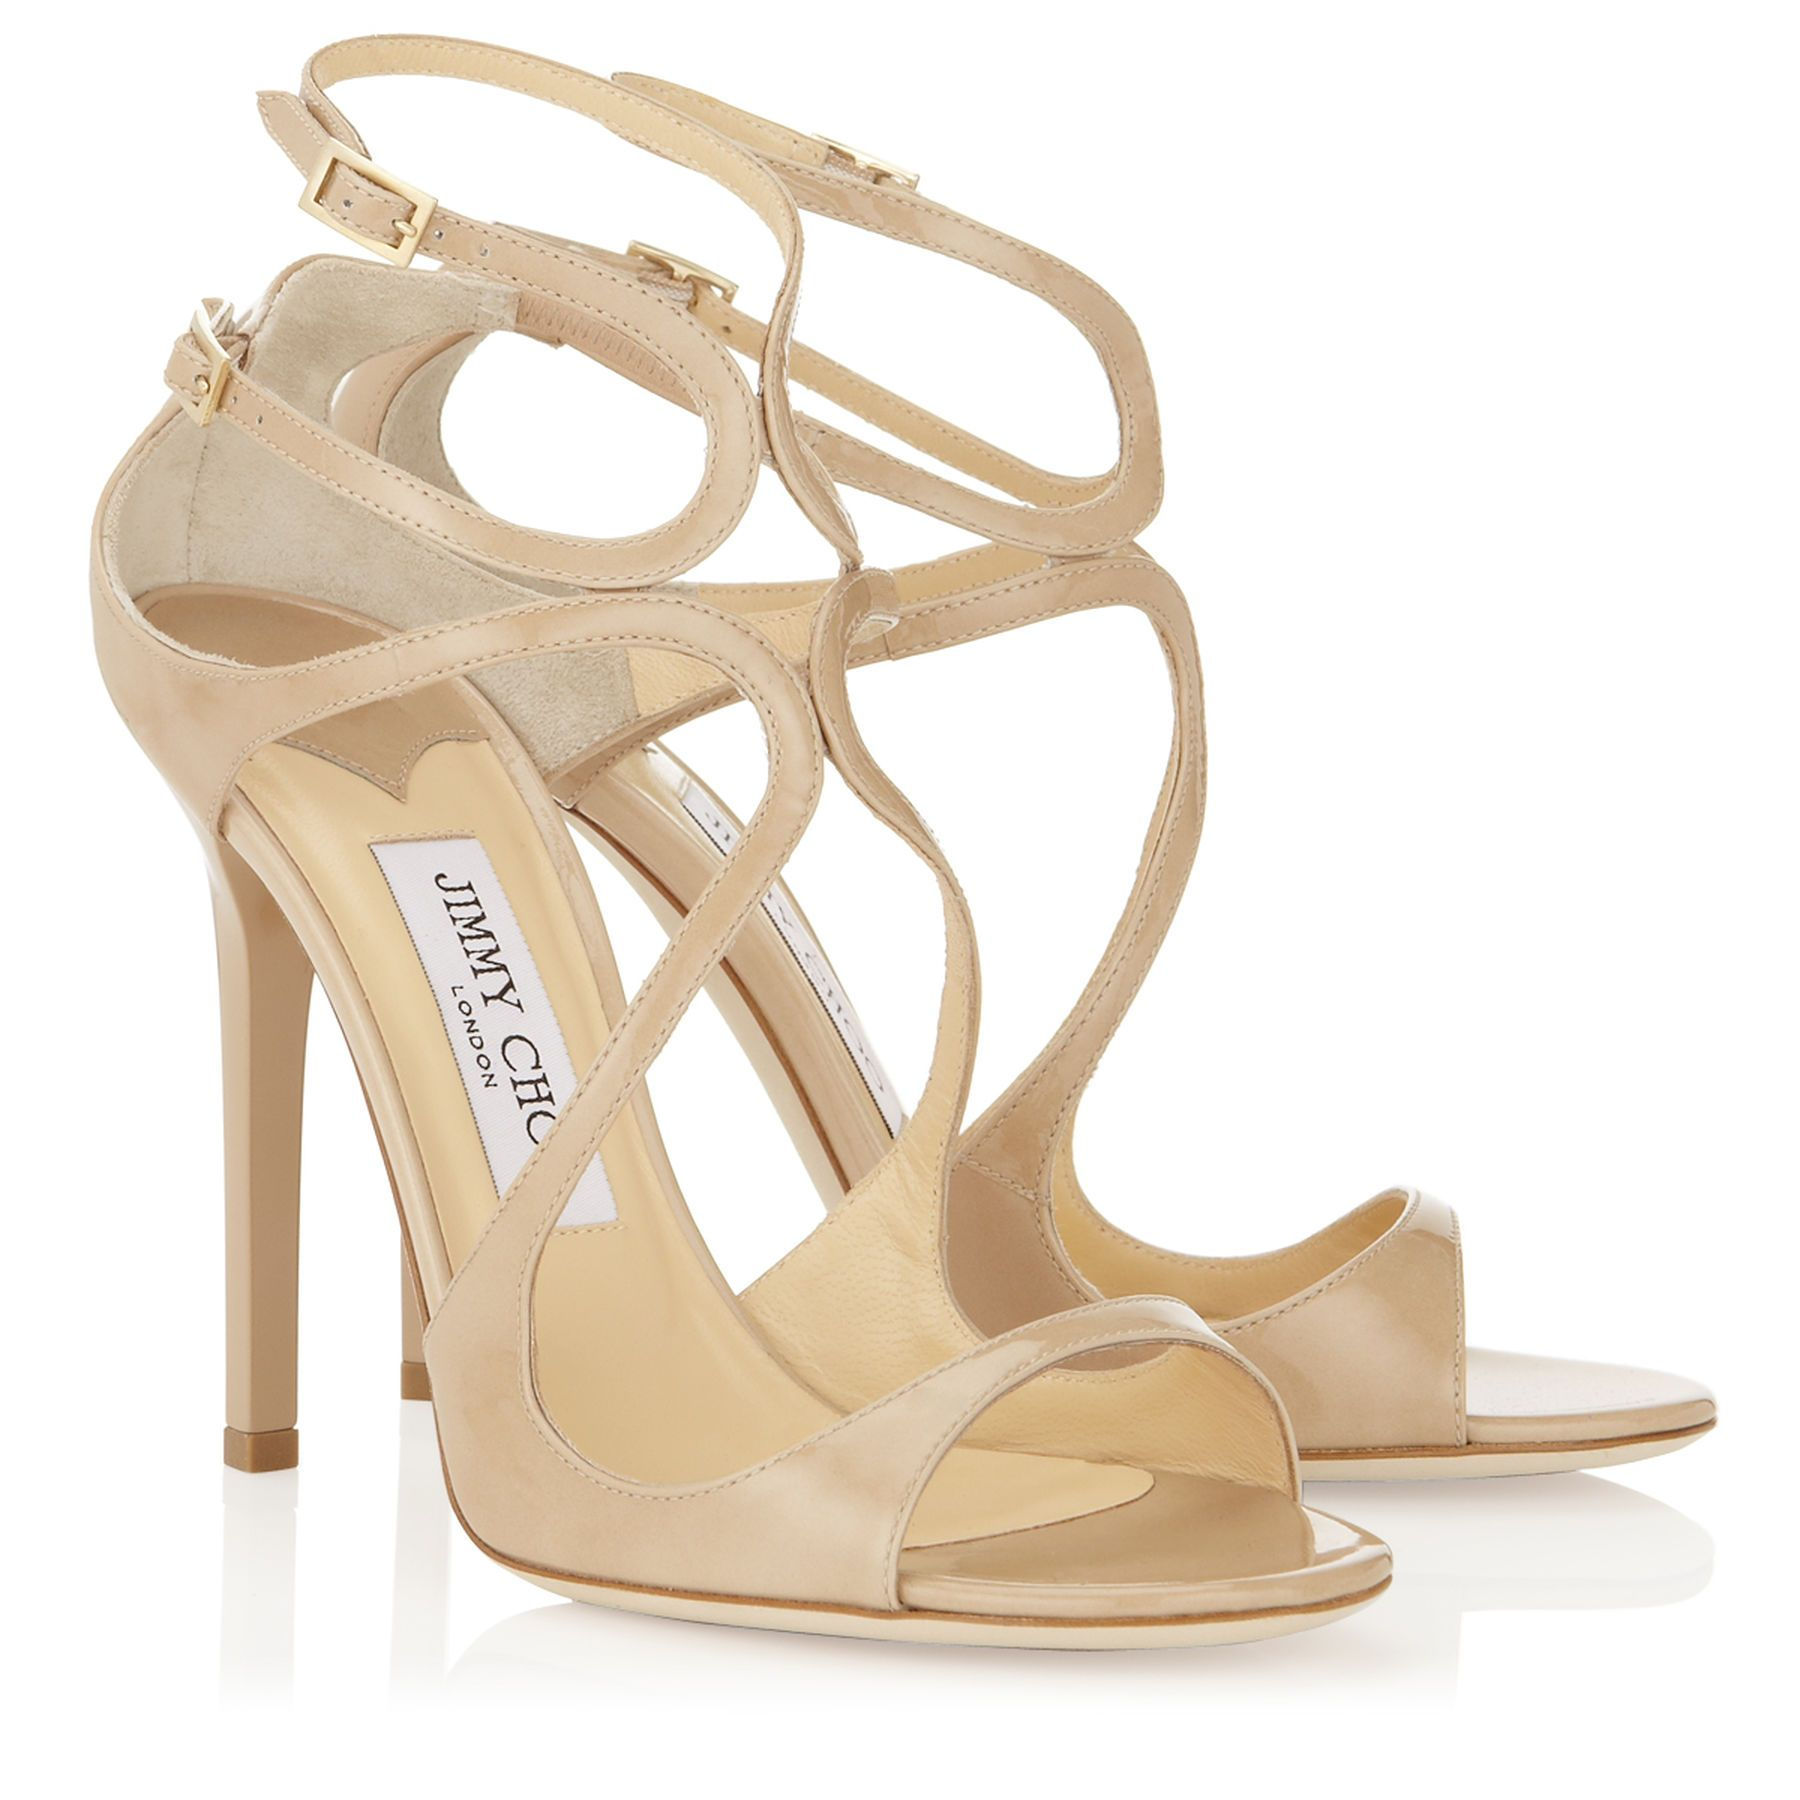 Ivette sandals - Nude & Neutrals Jimmy Choo London Footlocker Pictures Sale Online ngJPKGB